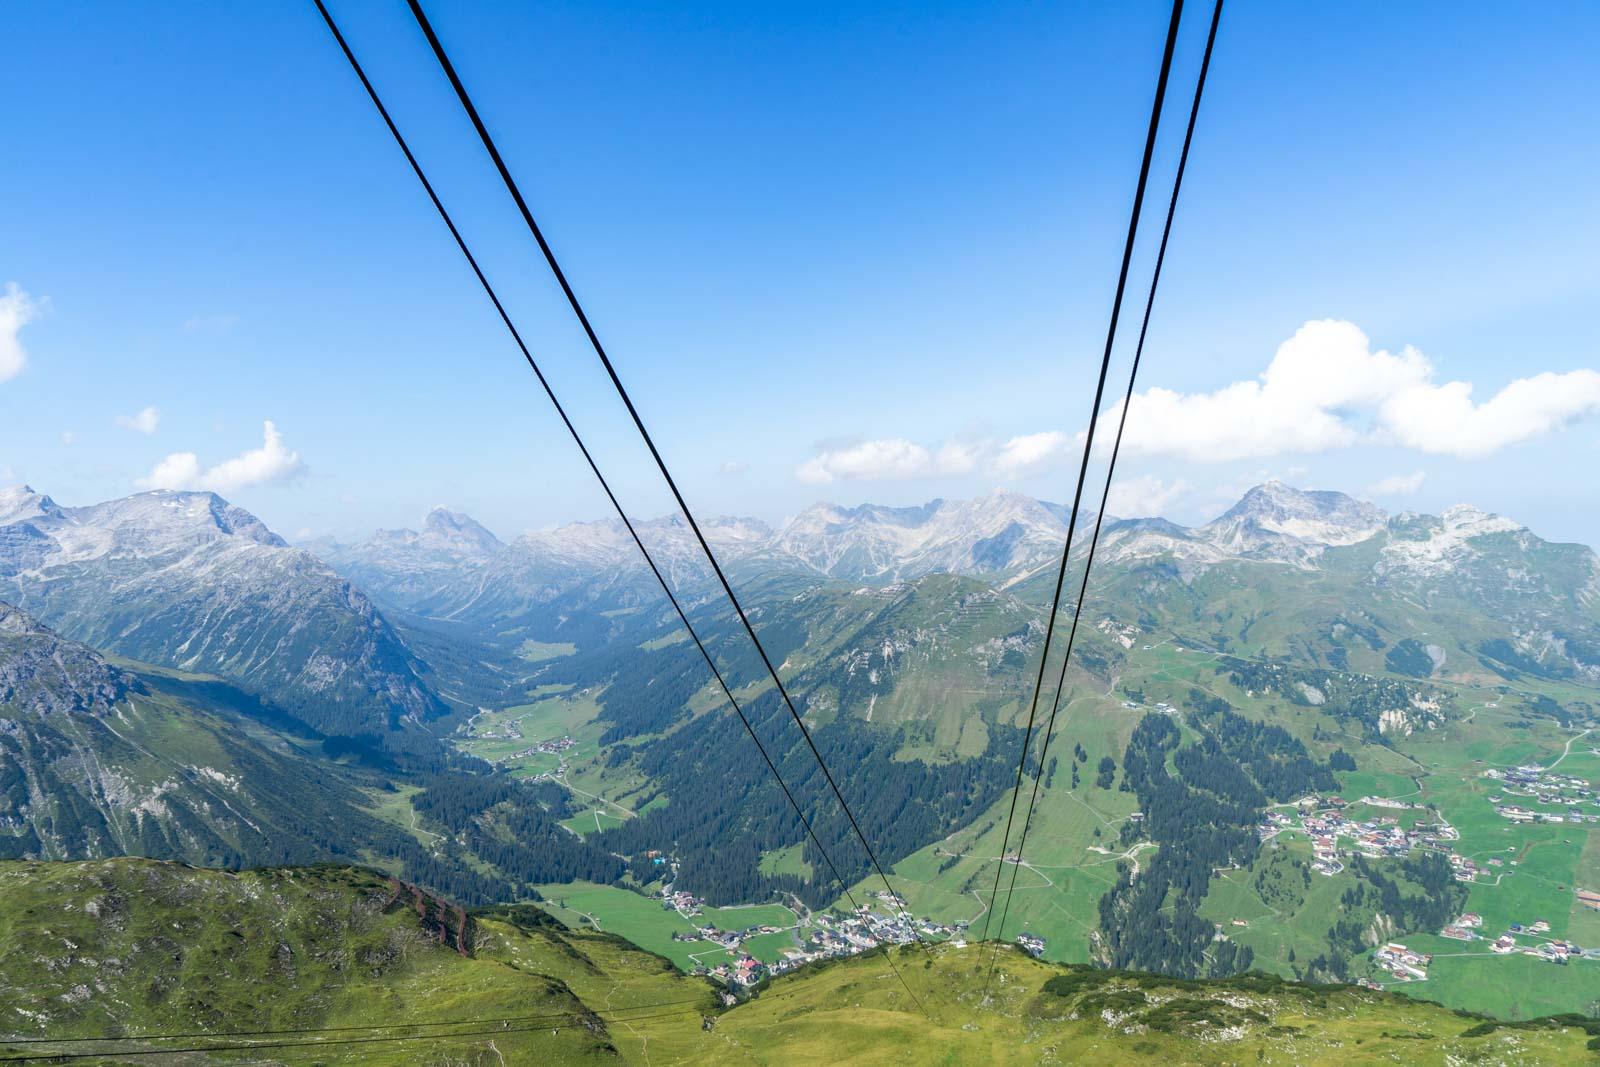 Rüfikopf cable car, Lech, Austria